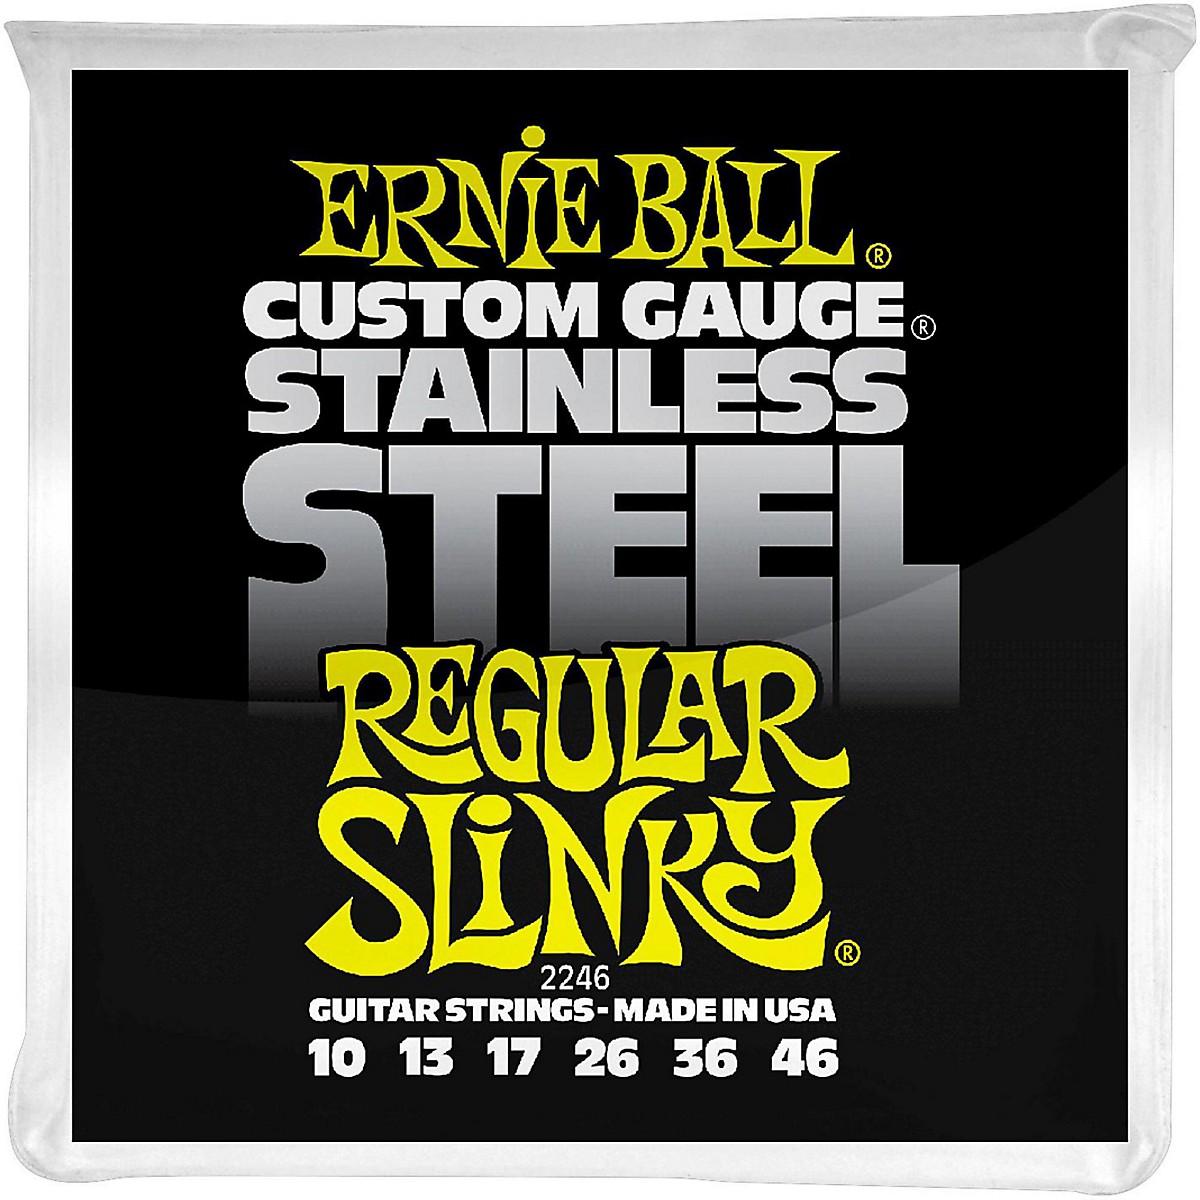 Ernie Ball 2246 Stainless Steel Regular Slinky Electric Guitar Strings